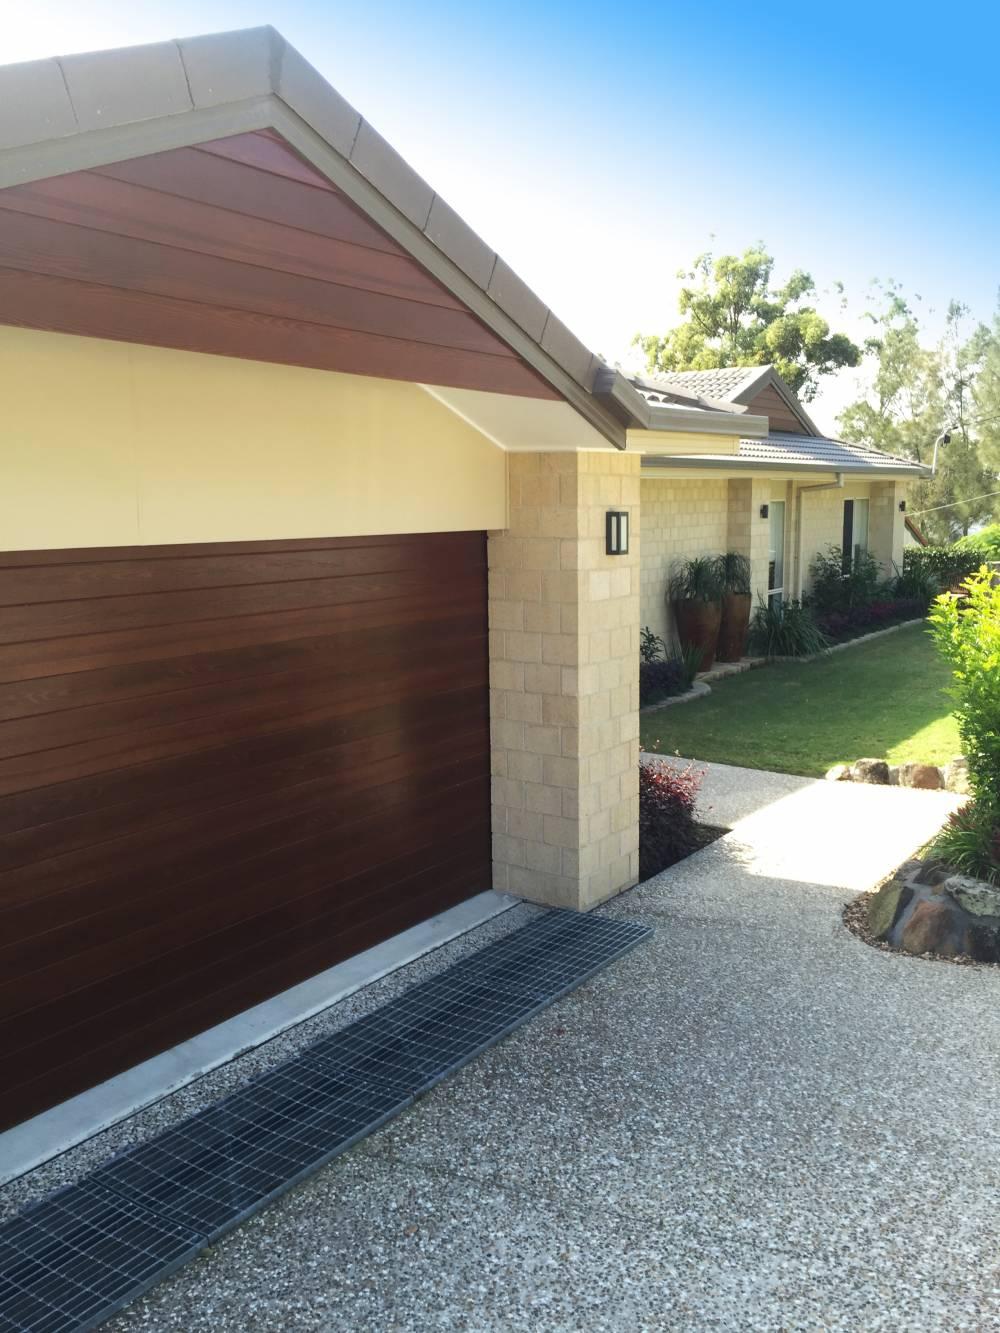 111-Timbertone-Mahogany-Cladding-to-match-Garage-Door.1a6dd7b6f2a02e37eb283d8336b98da3